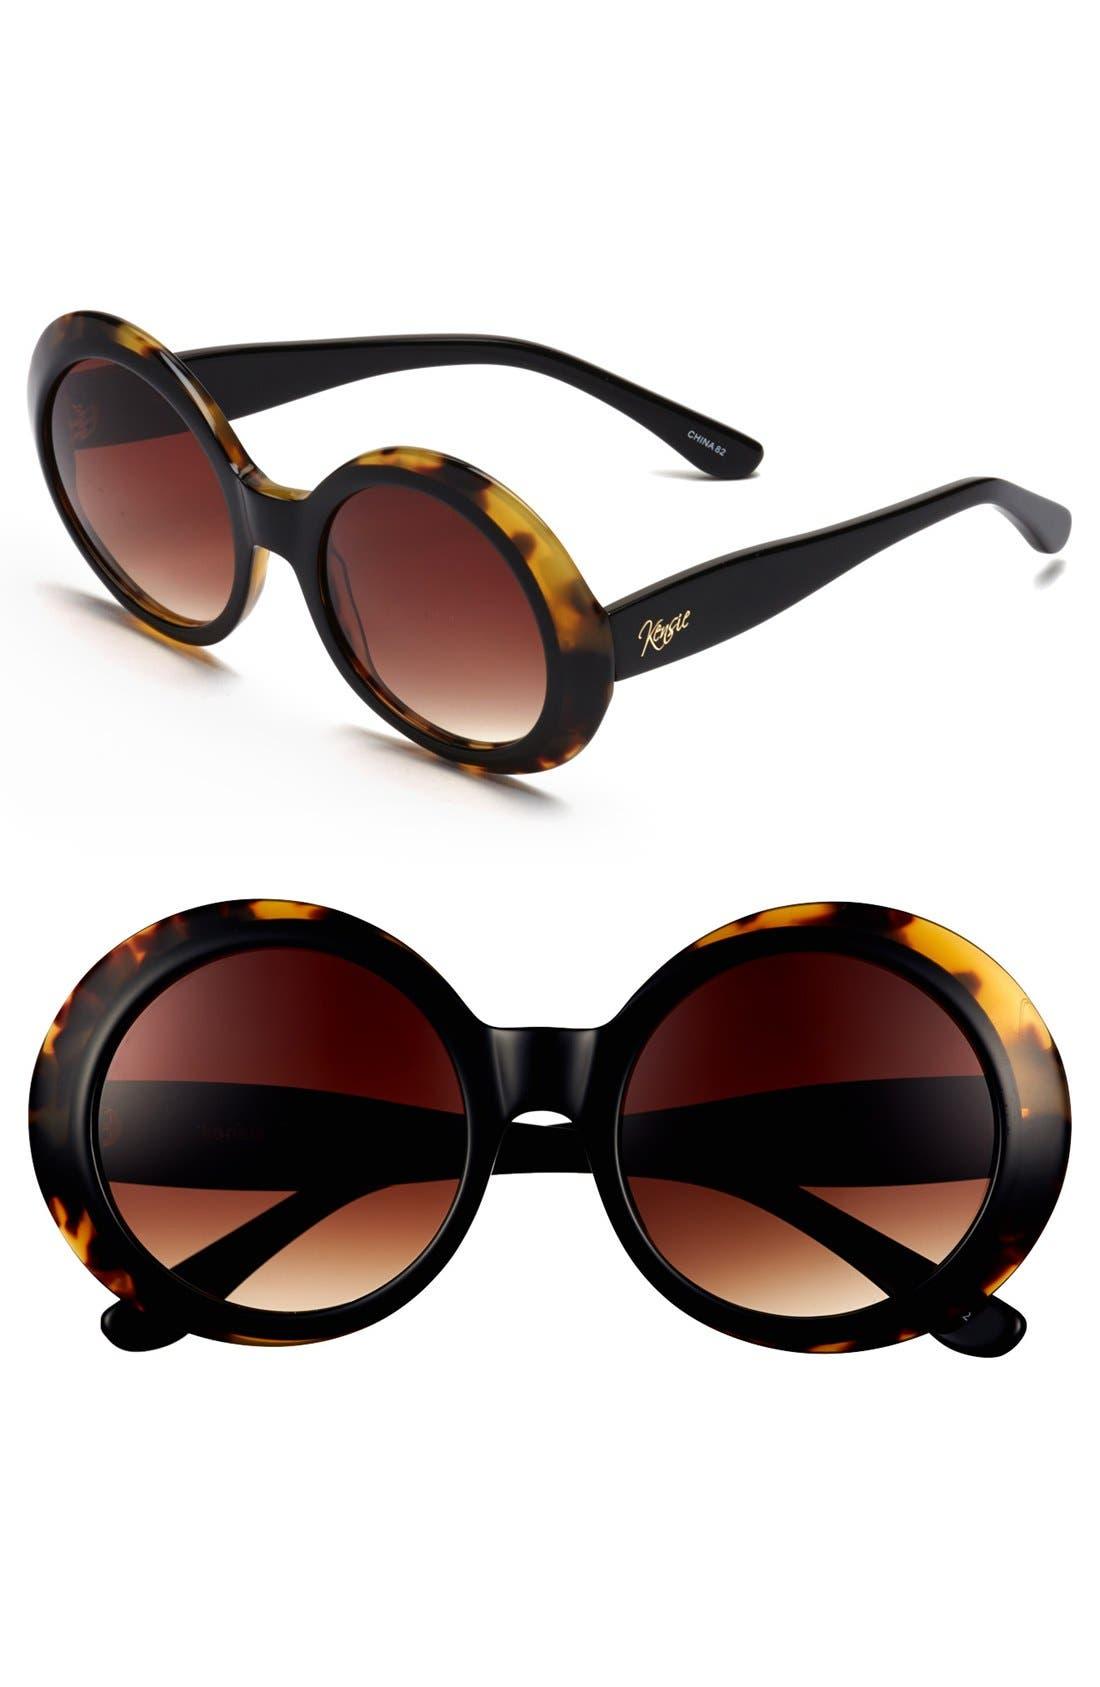 Main Image - kensie 'Neve' 50mm Oversized Sunglasses